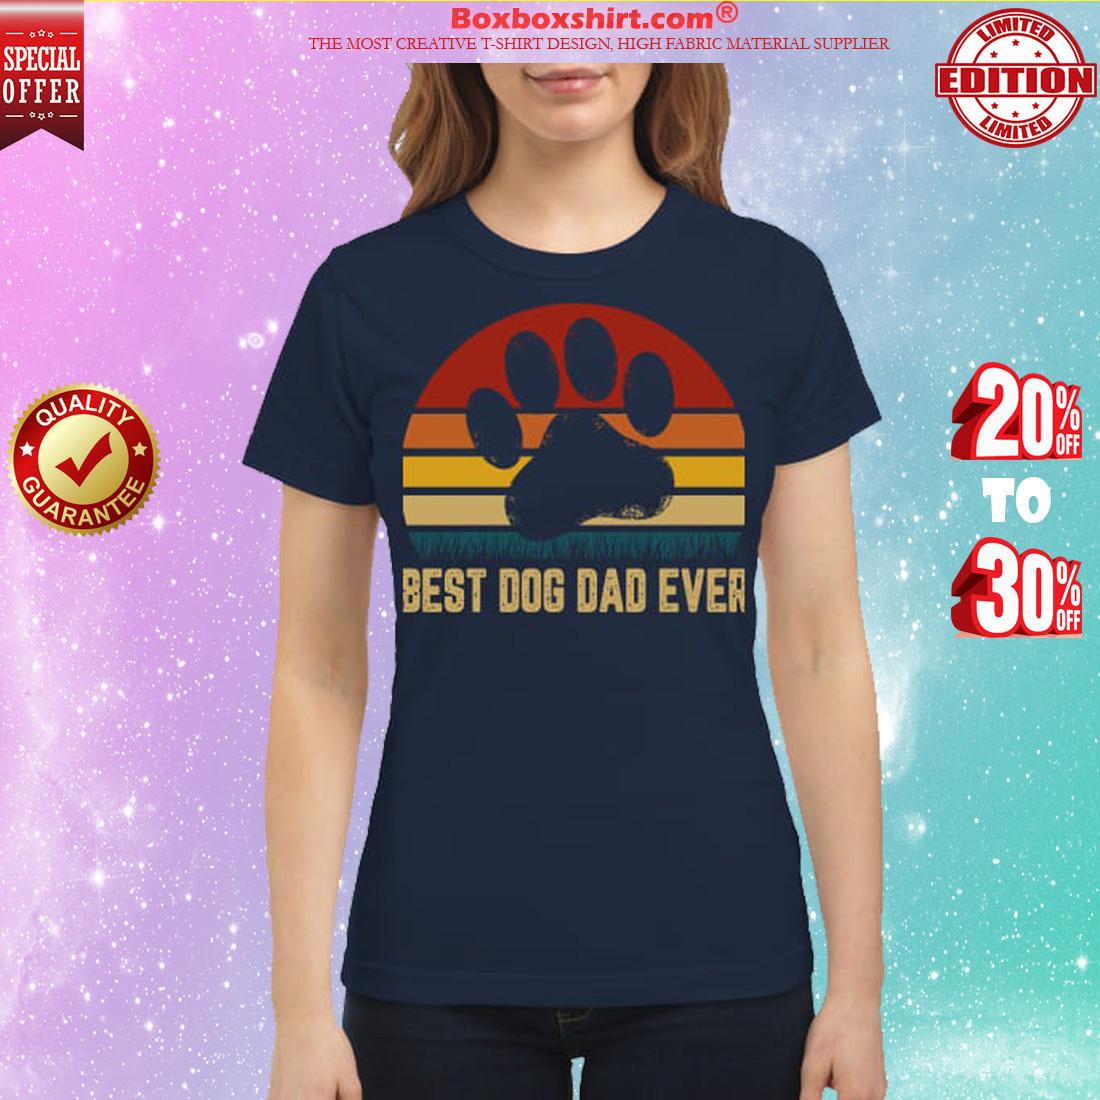 Best dog dad ever classic shirt